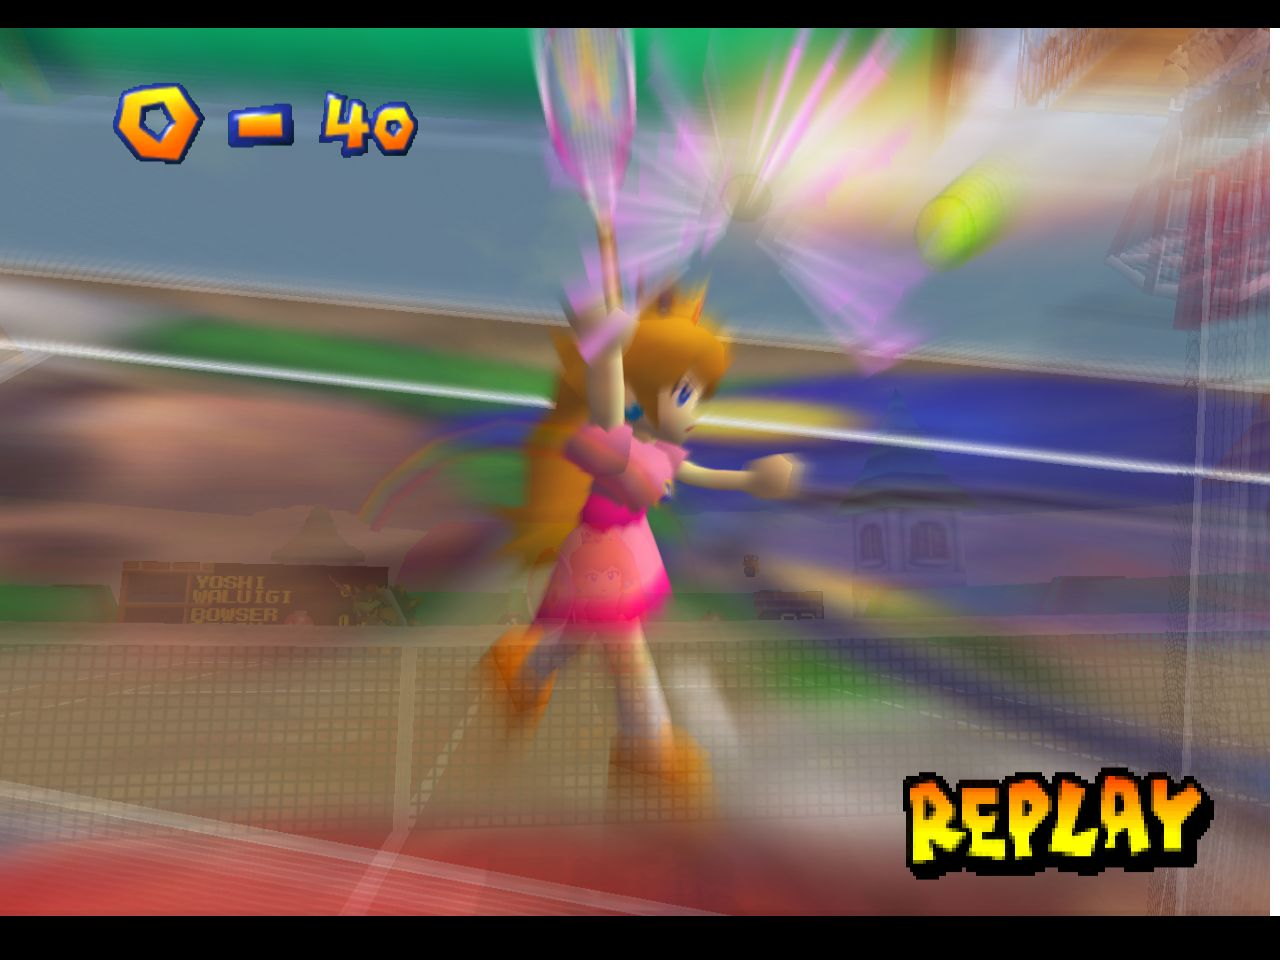 The Nintendo 64 Appreciation/Collecting/Emulation Thread